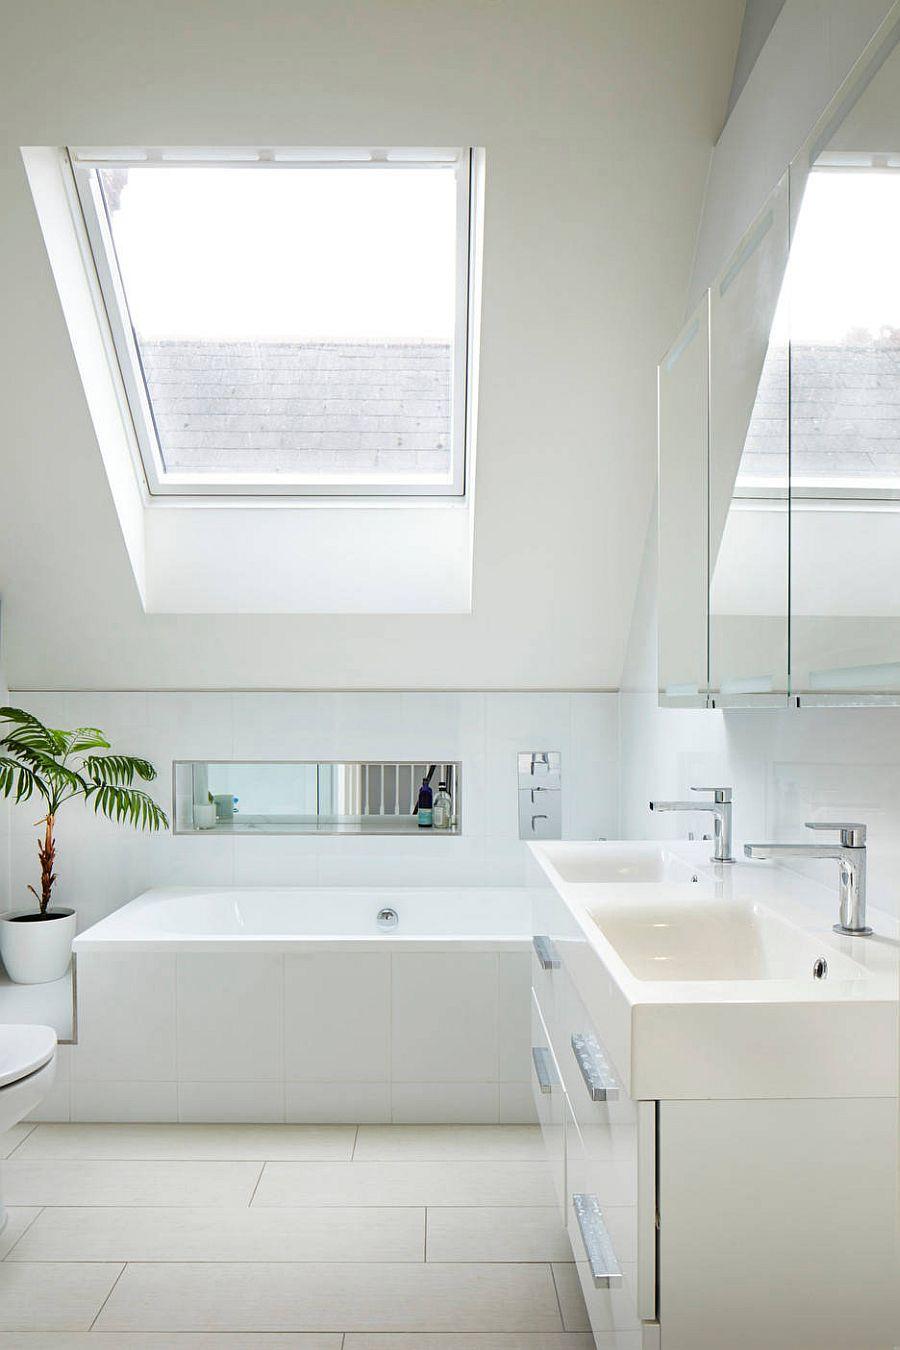 Monochromatic-all-white-bathroom-in-the-attic-with-white-all-around-68935